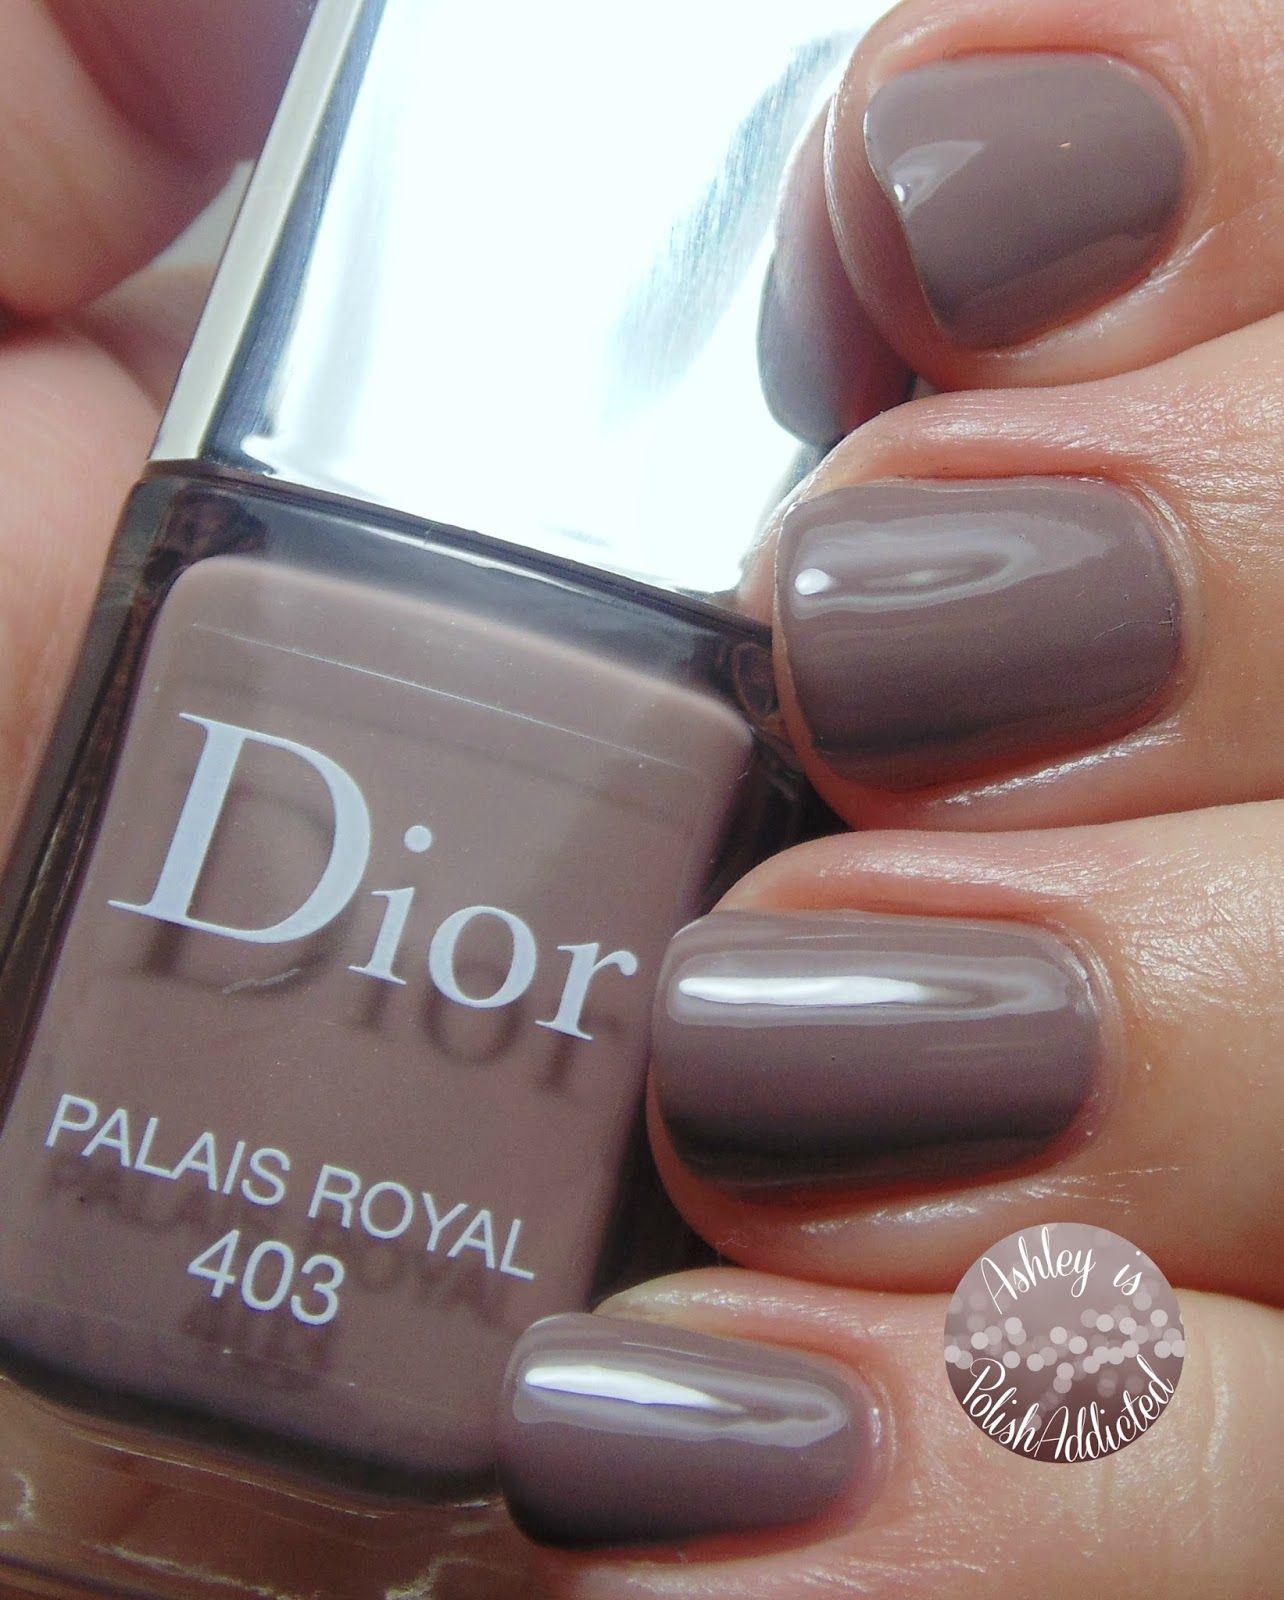 Dior Palais Royal - Swatches and Review   Dior   Pinterest